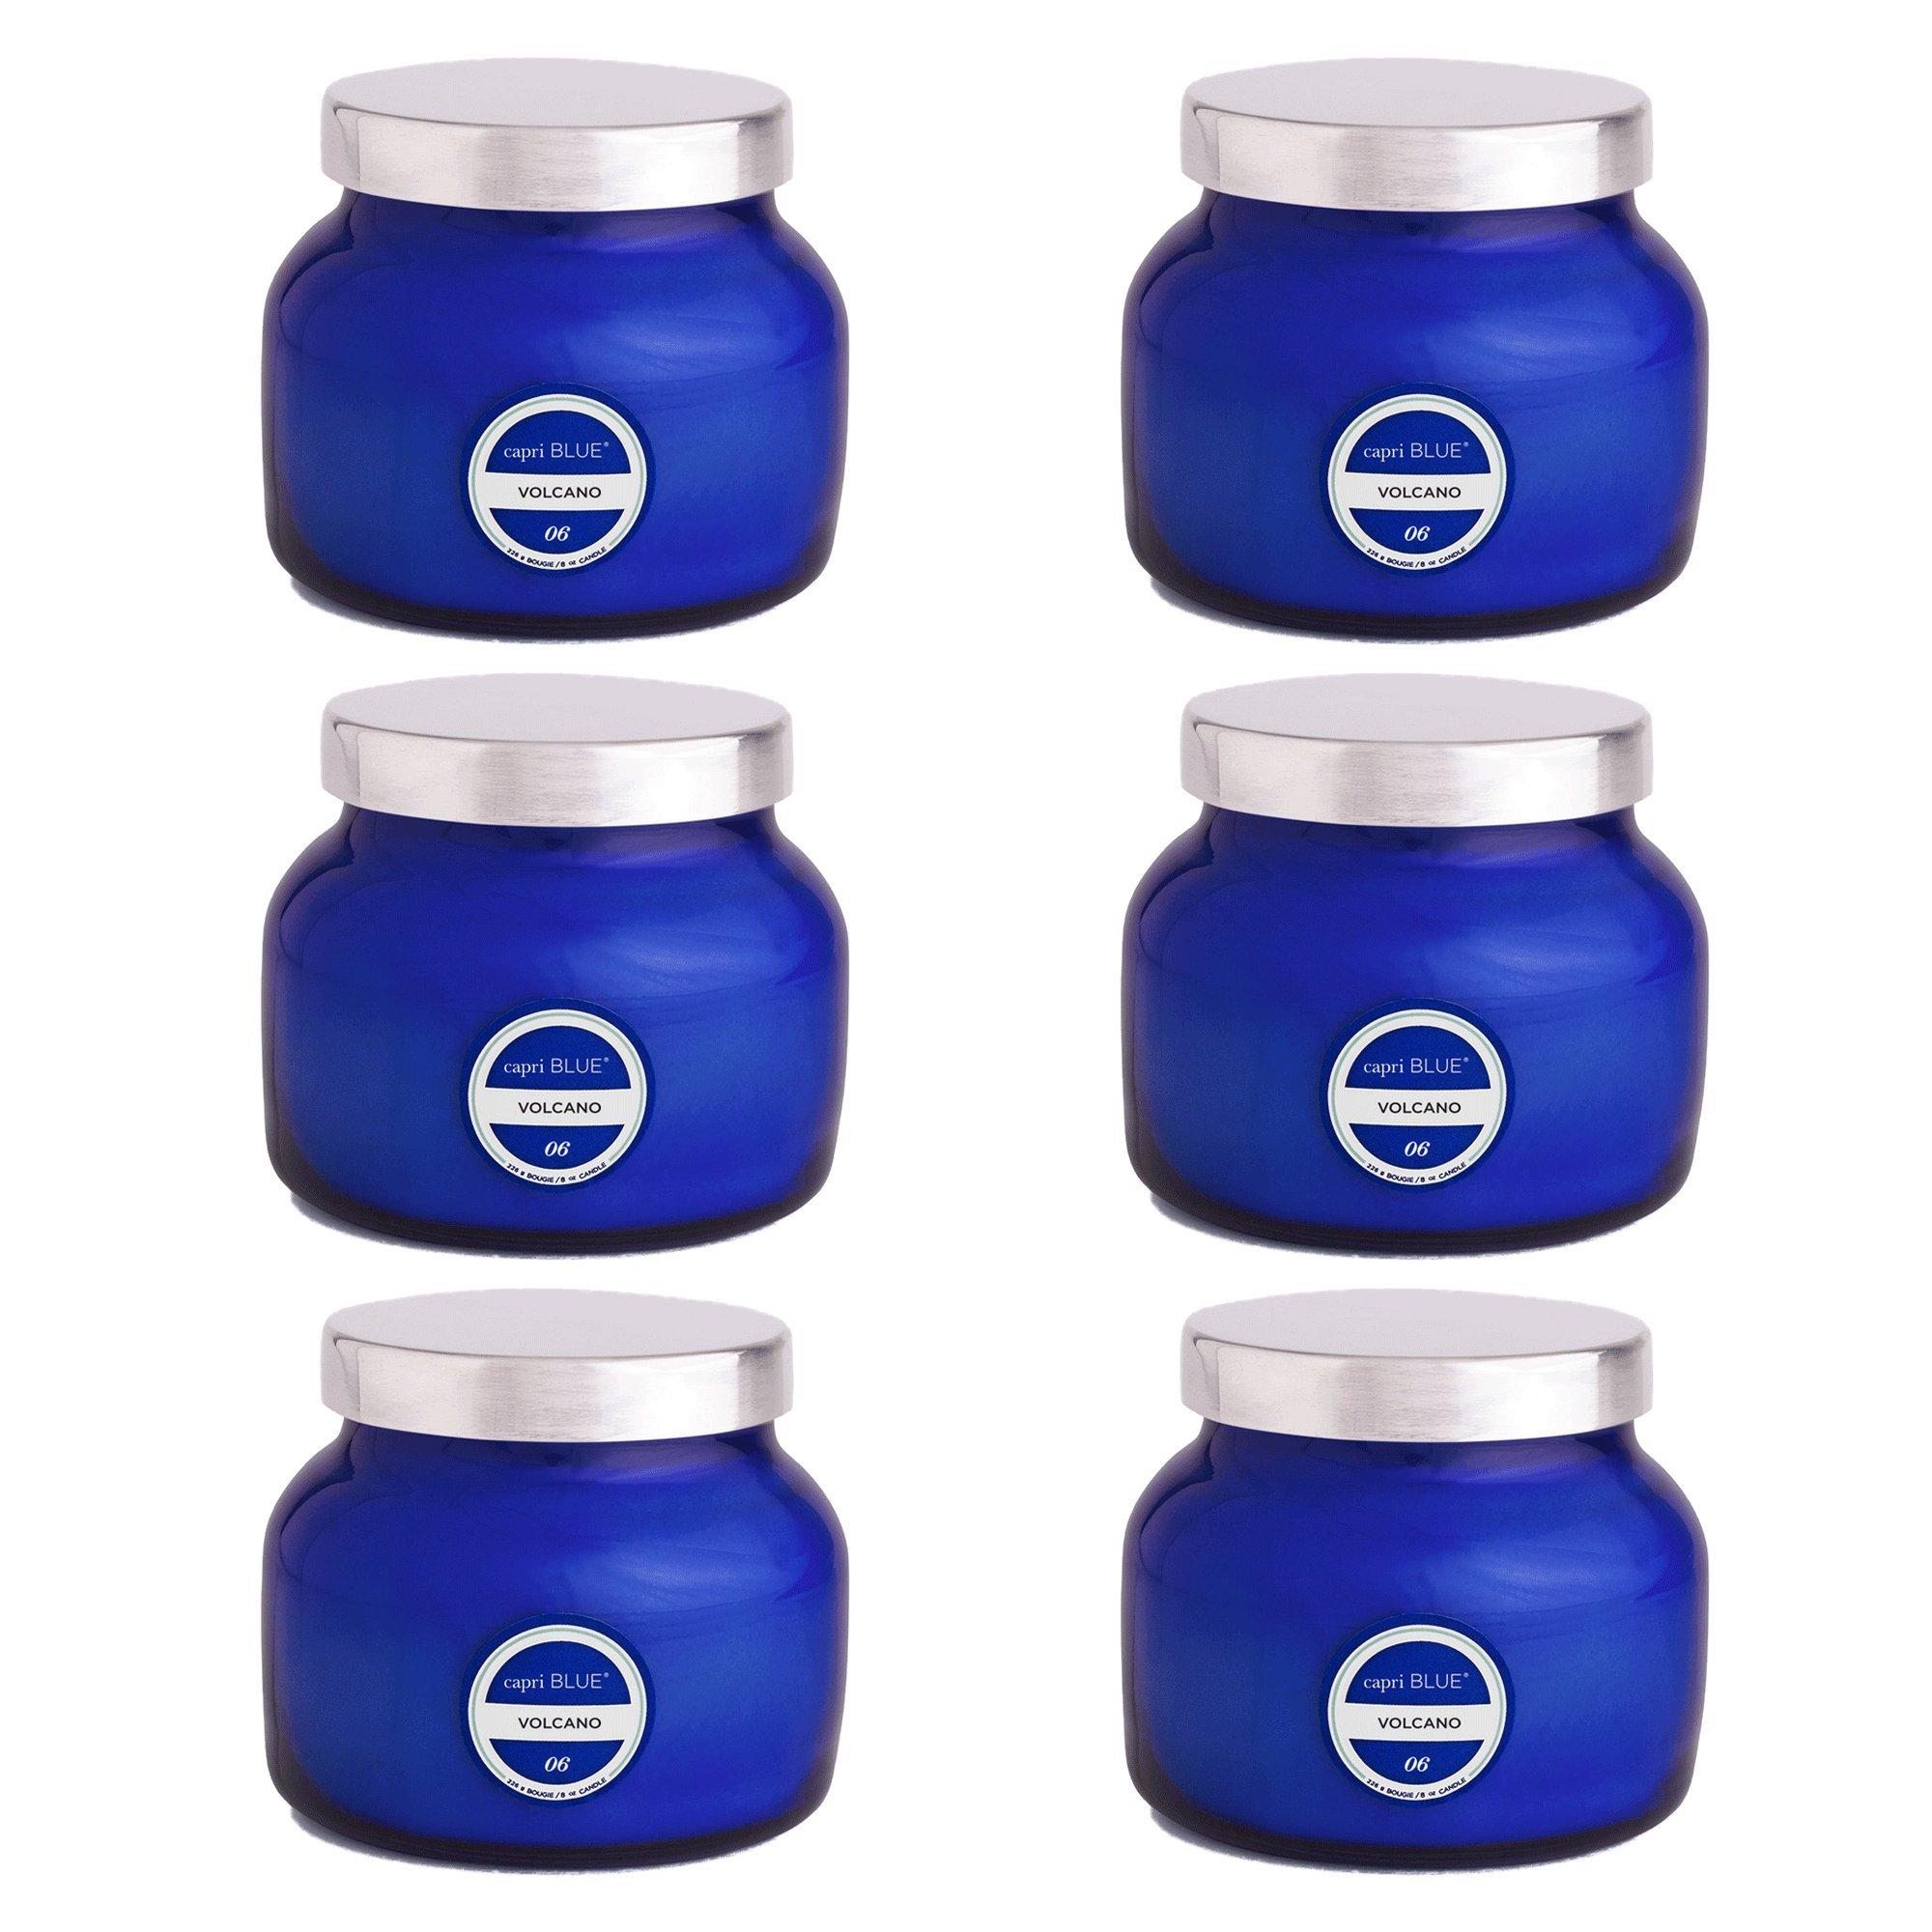 Capri Blue 8 oz Signature Petite Blue Jar Volcano (6 pack), Assorted, One Size by Capri Blue